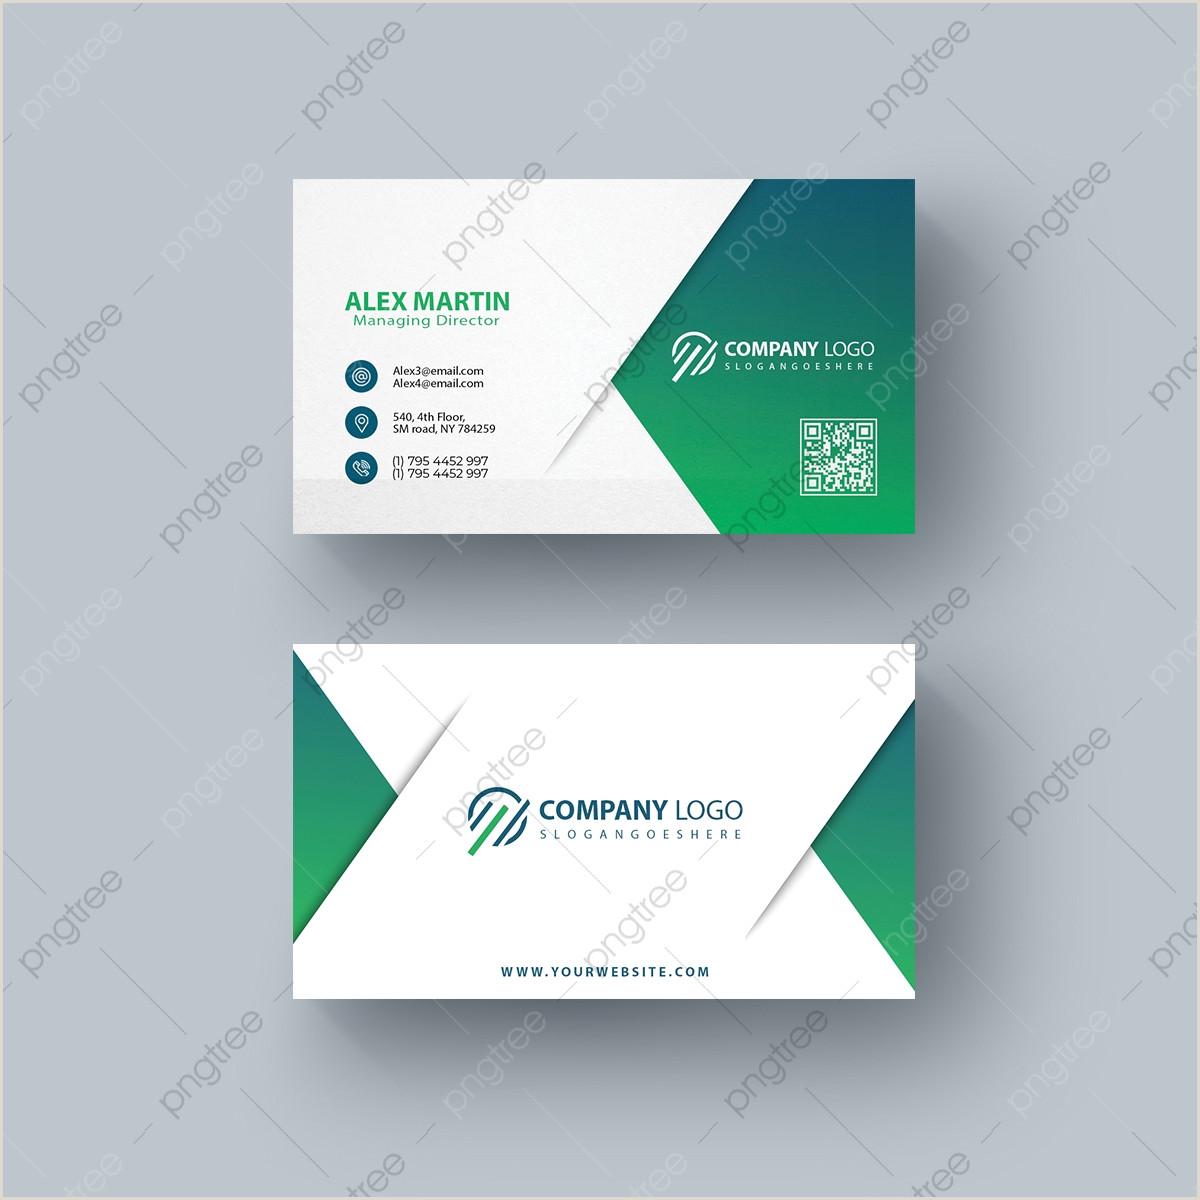 Business Card Desing Business Card Design Png